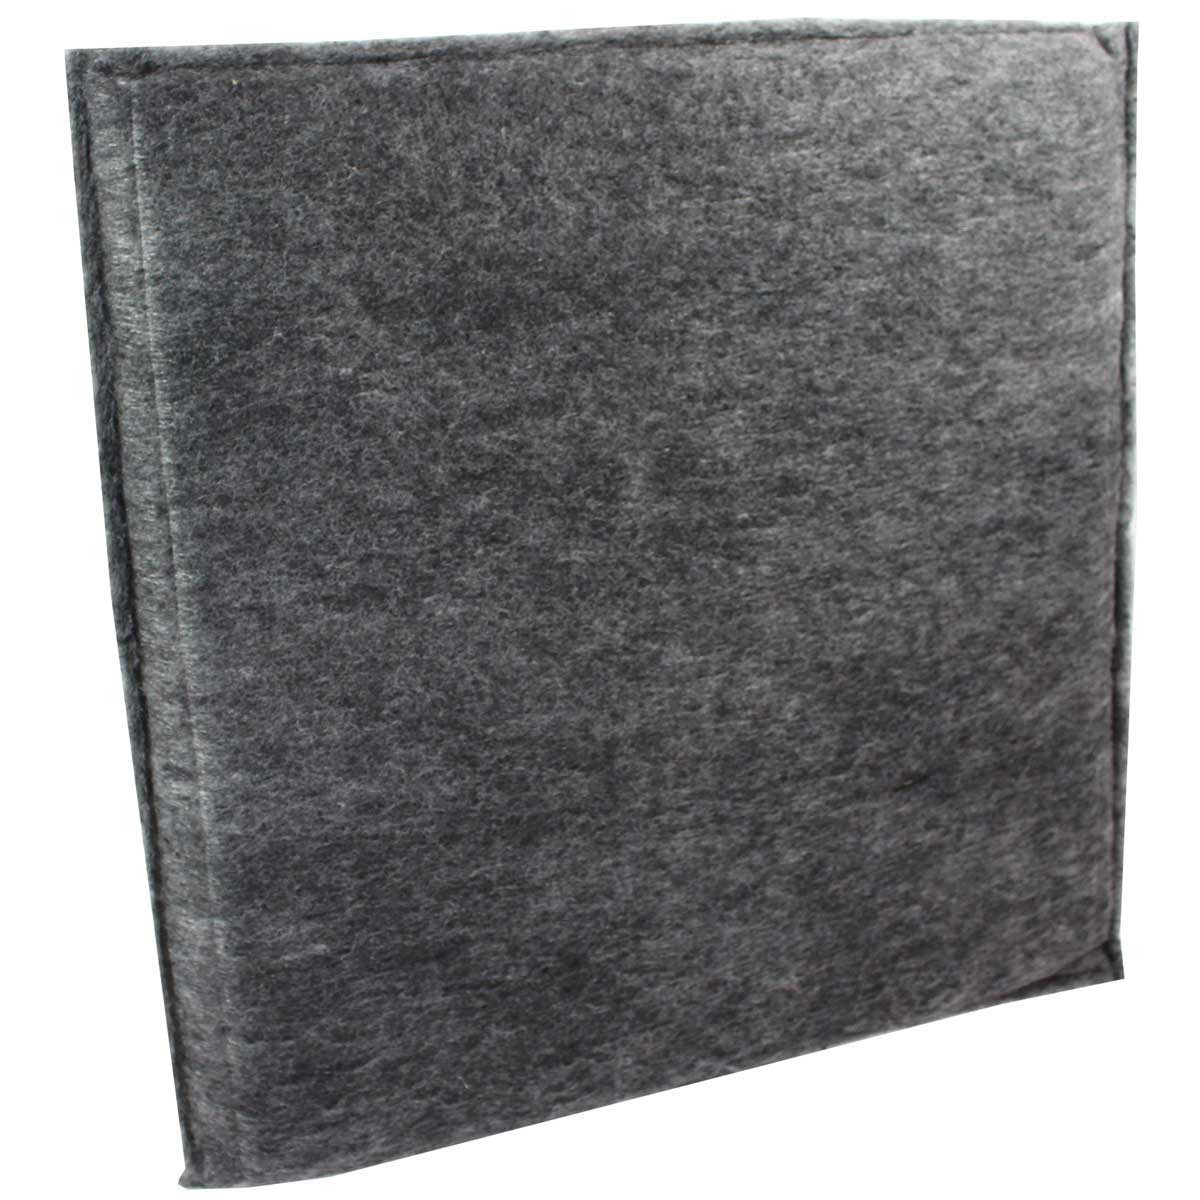 Novatek Novair 700 and 1000 Charcoal Filter 2